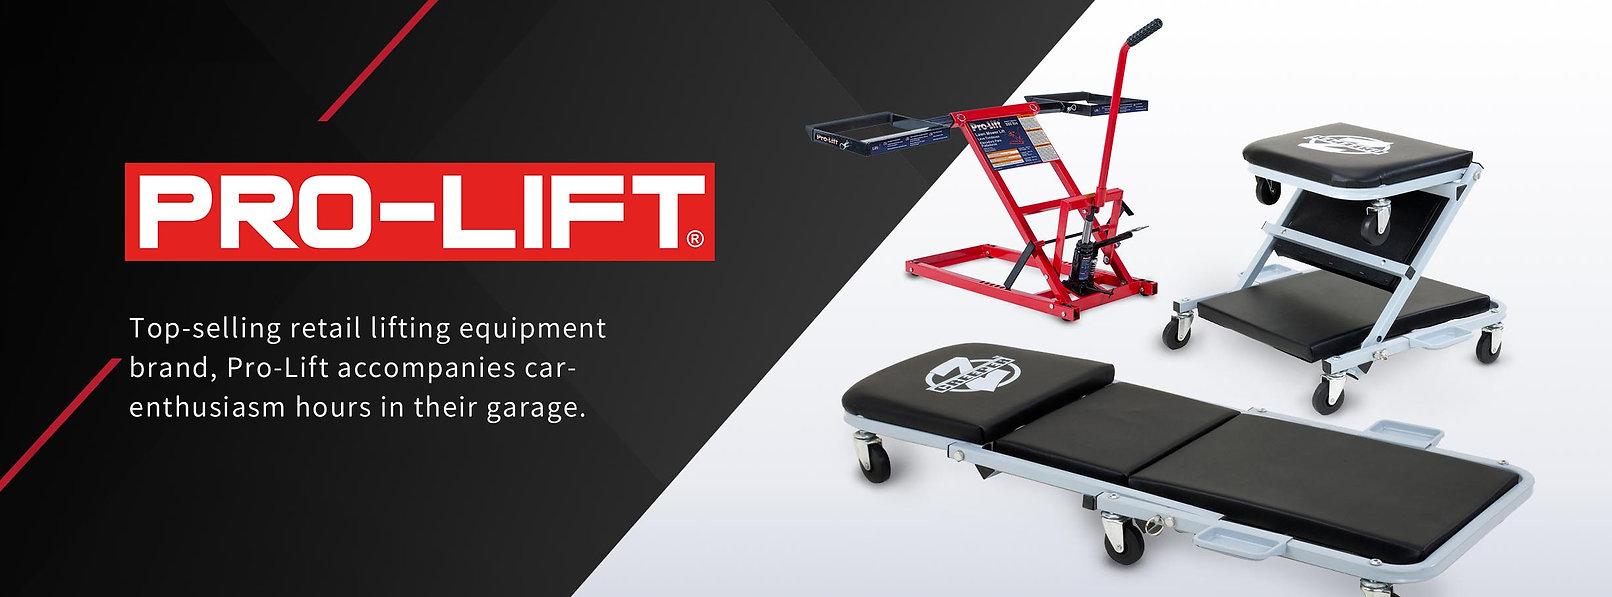 Pro-lift.jpg